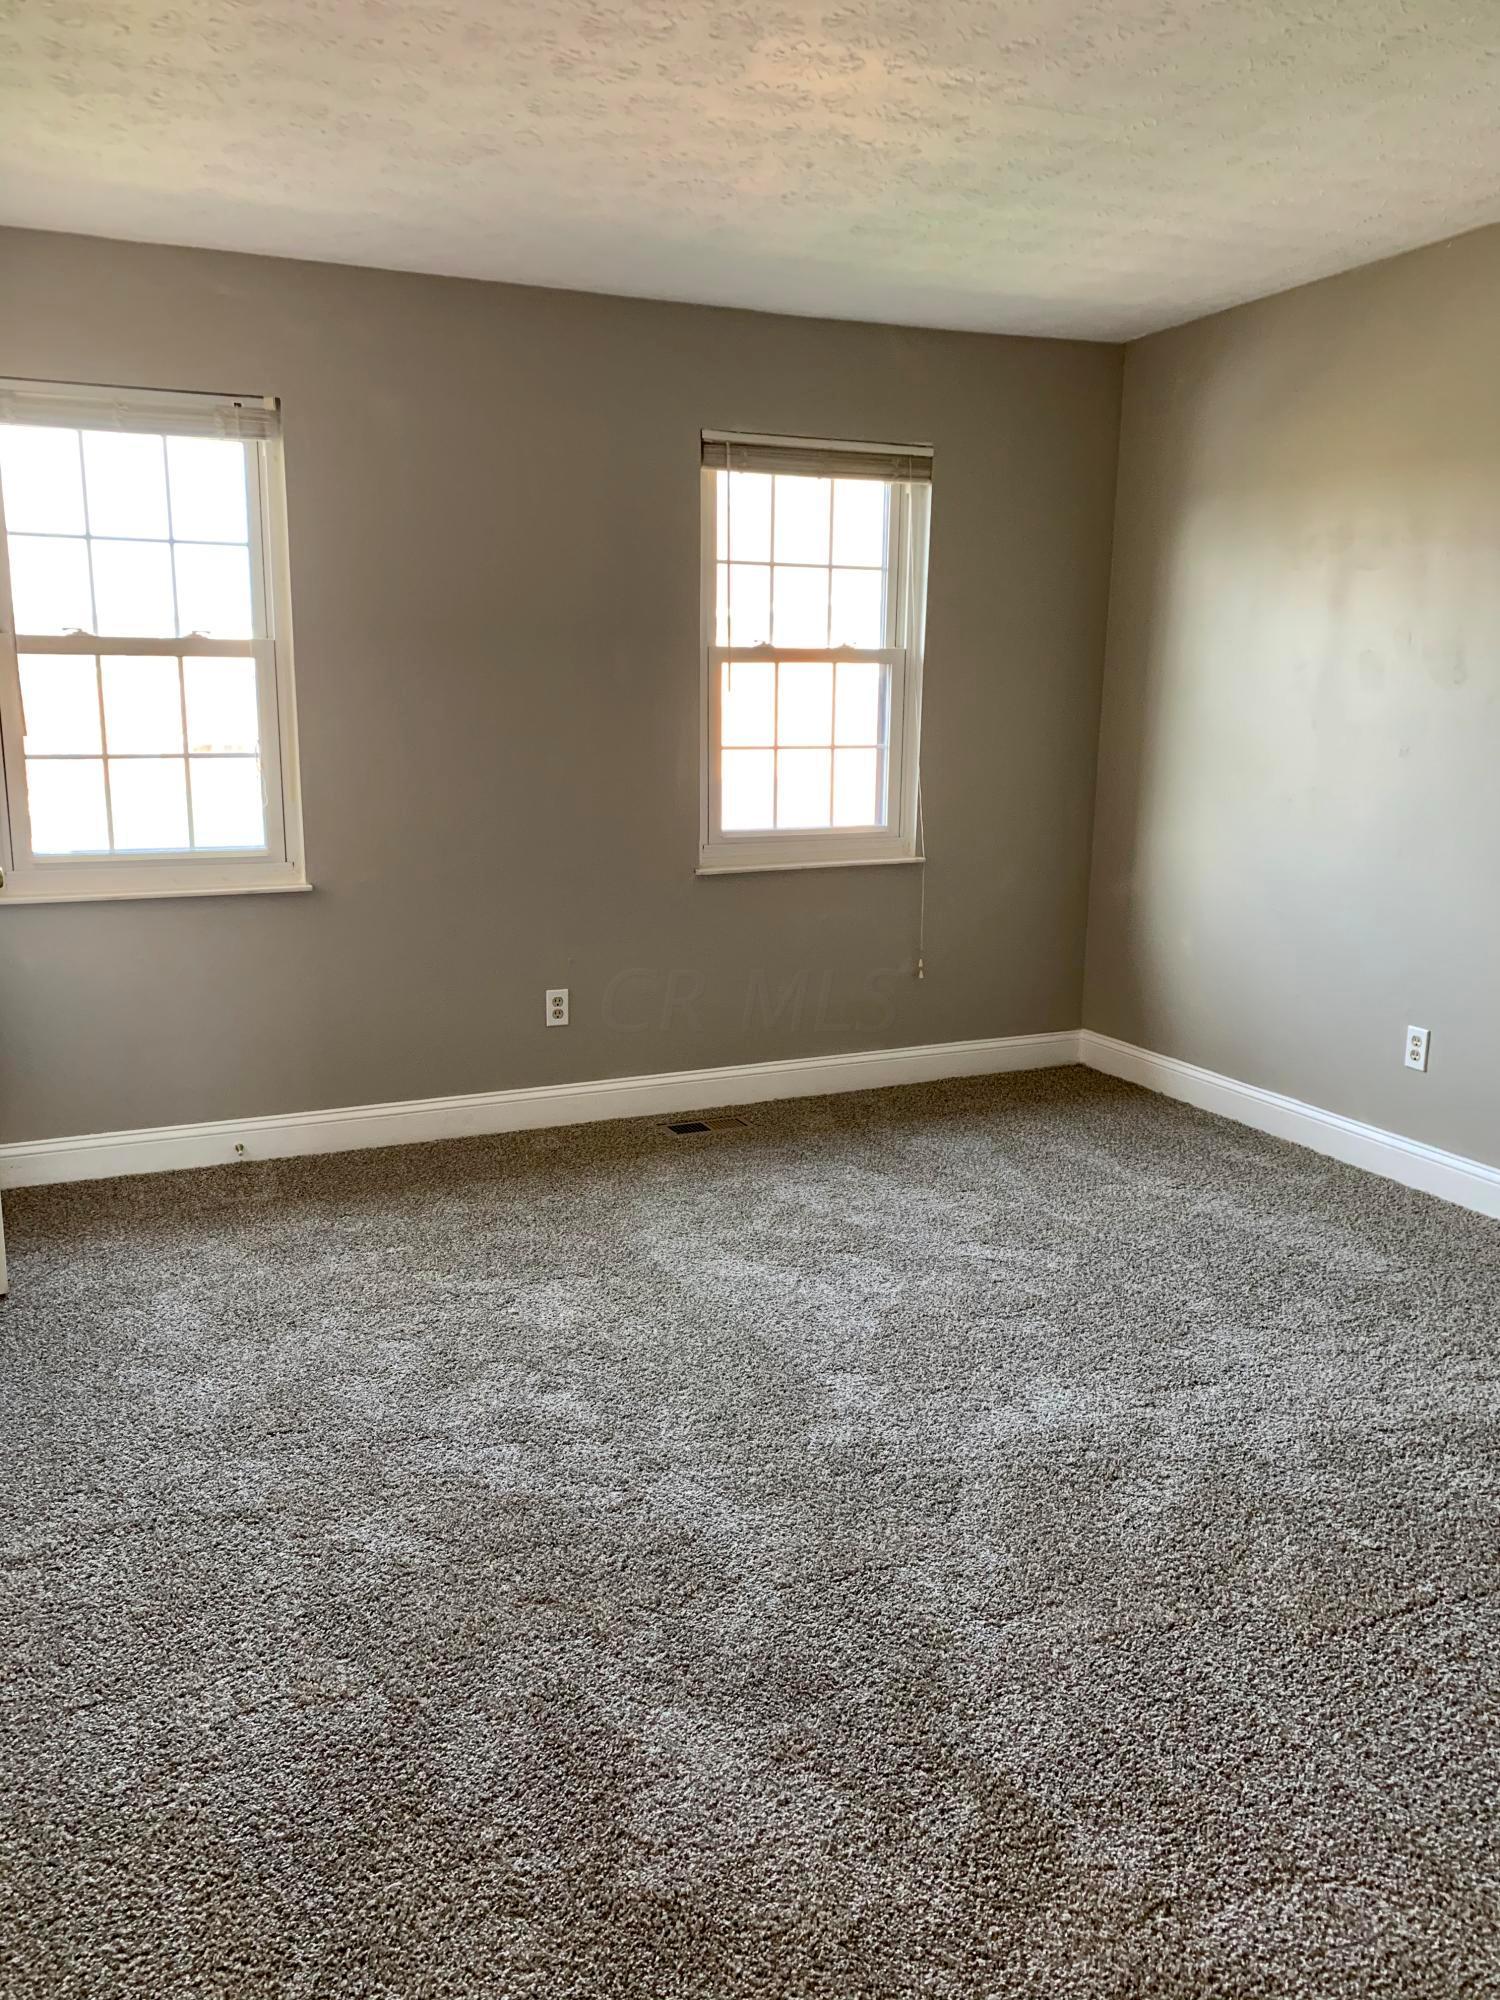 6456 Brookedge Court, Dublin, Ohio 43017, 2 Bedrooms Bedrooms, ,2 BathroomsBathrooms,Residential,For Sale,Brookedge,220040730